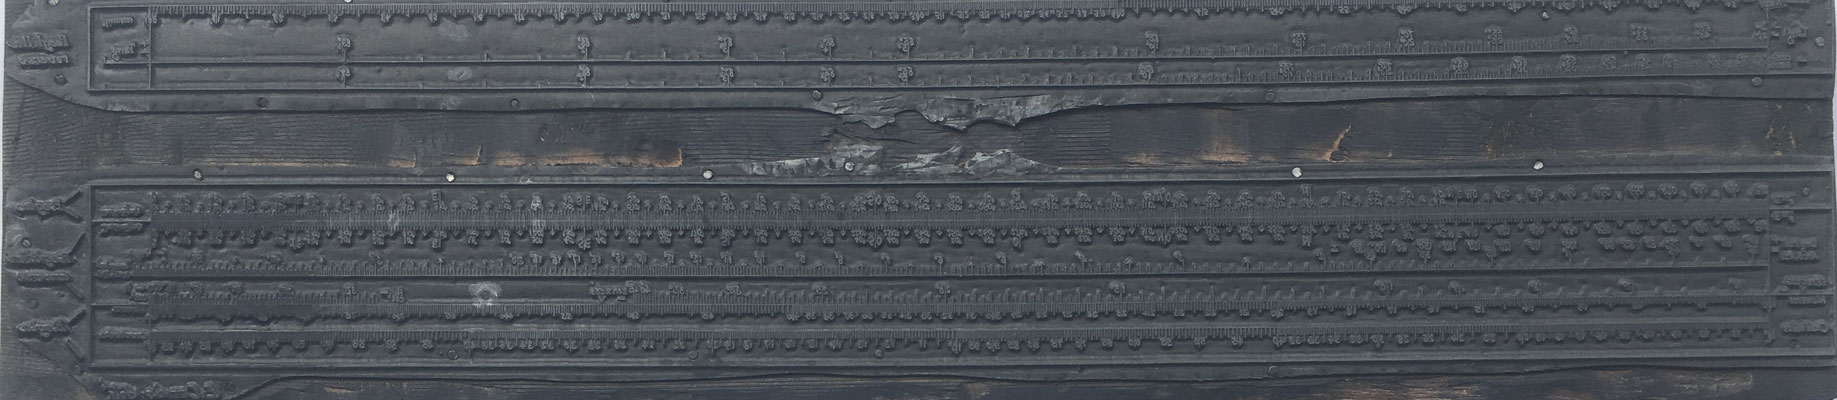 Cliché (matriz o plancha de imprenta) hecha en metal sobre base de madera para máquina plana de la Regla E. CONDE (modelo 1), 45x10.5 cm